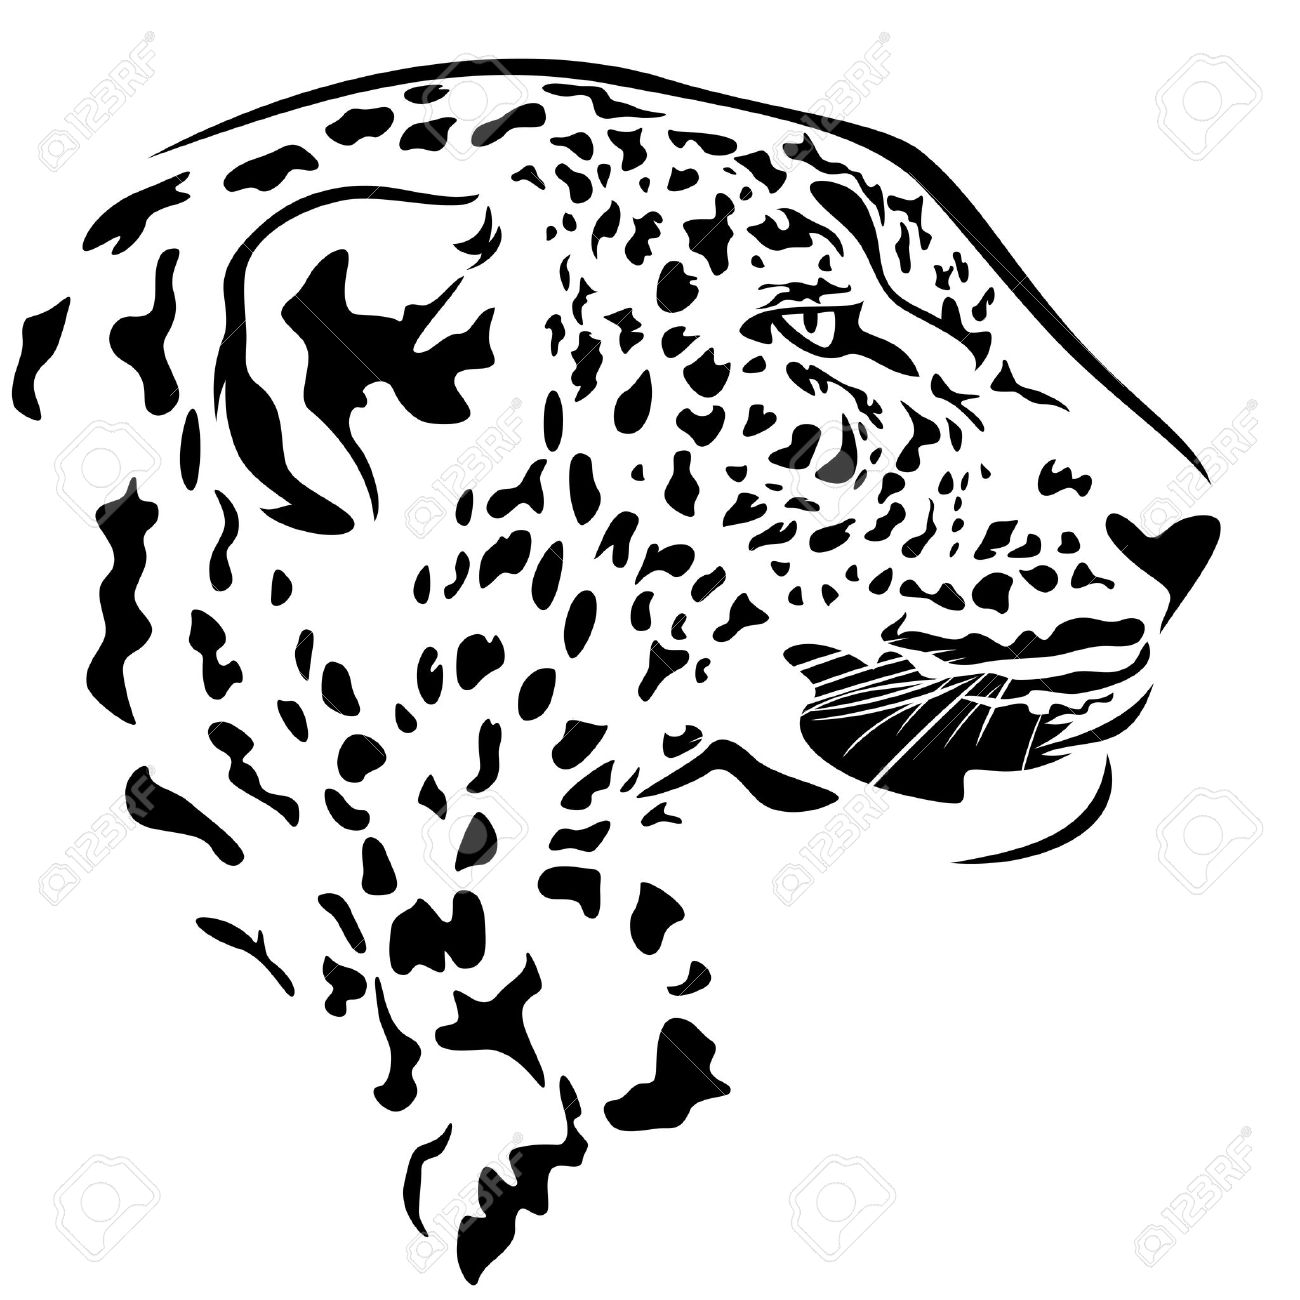 leopard head profile design - black and white animal outline - 27446330